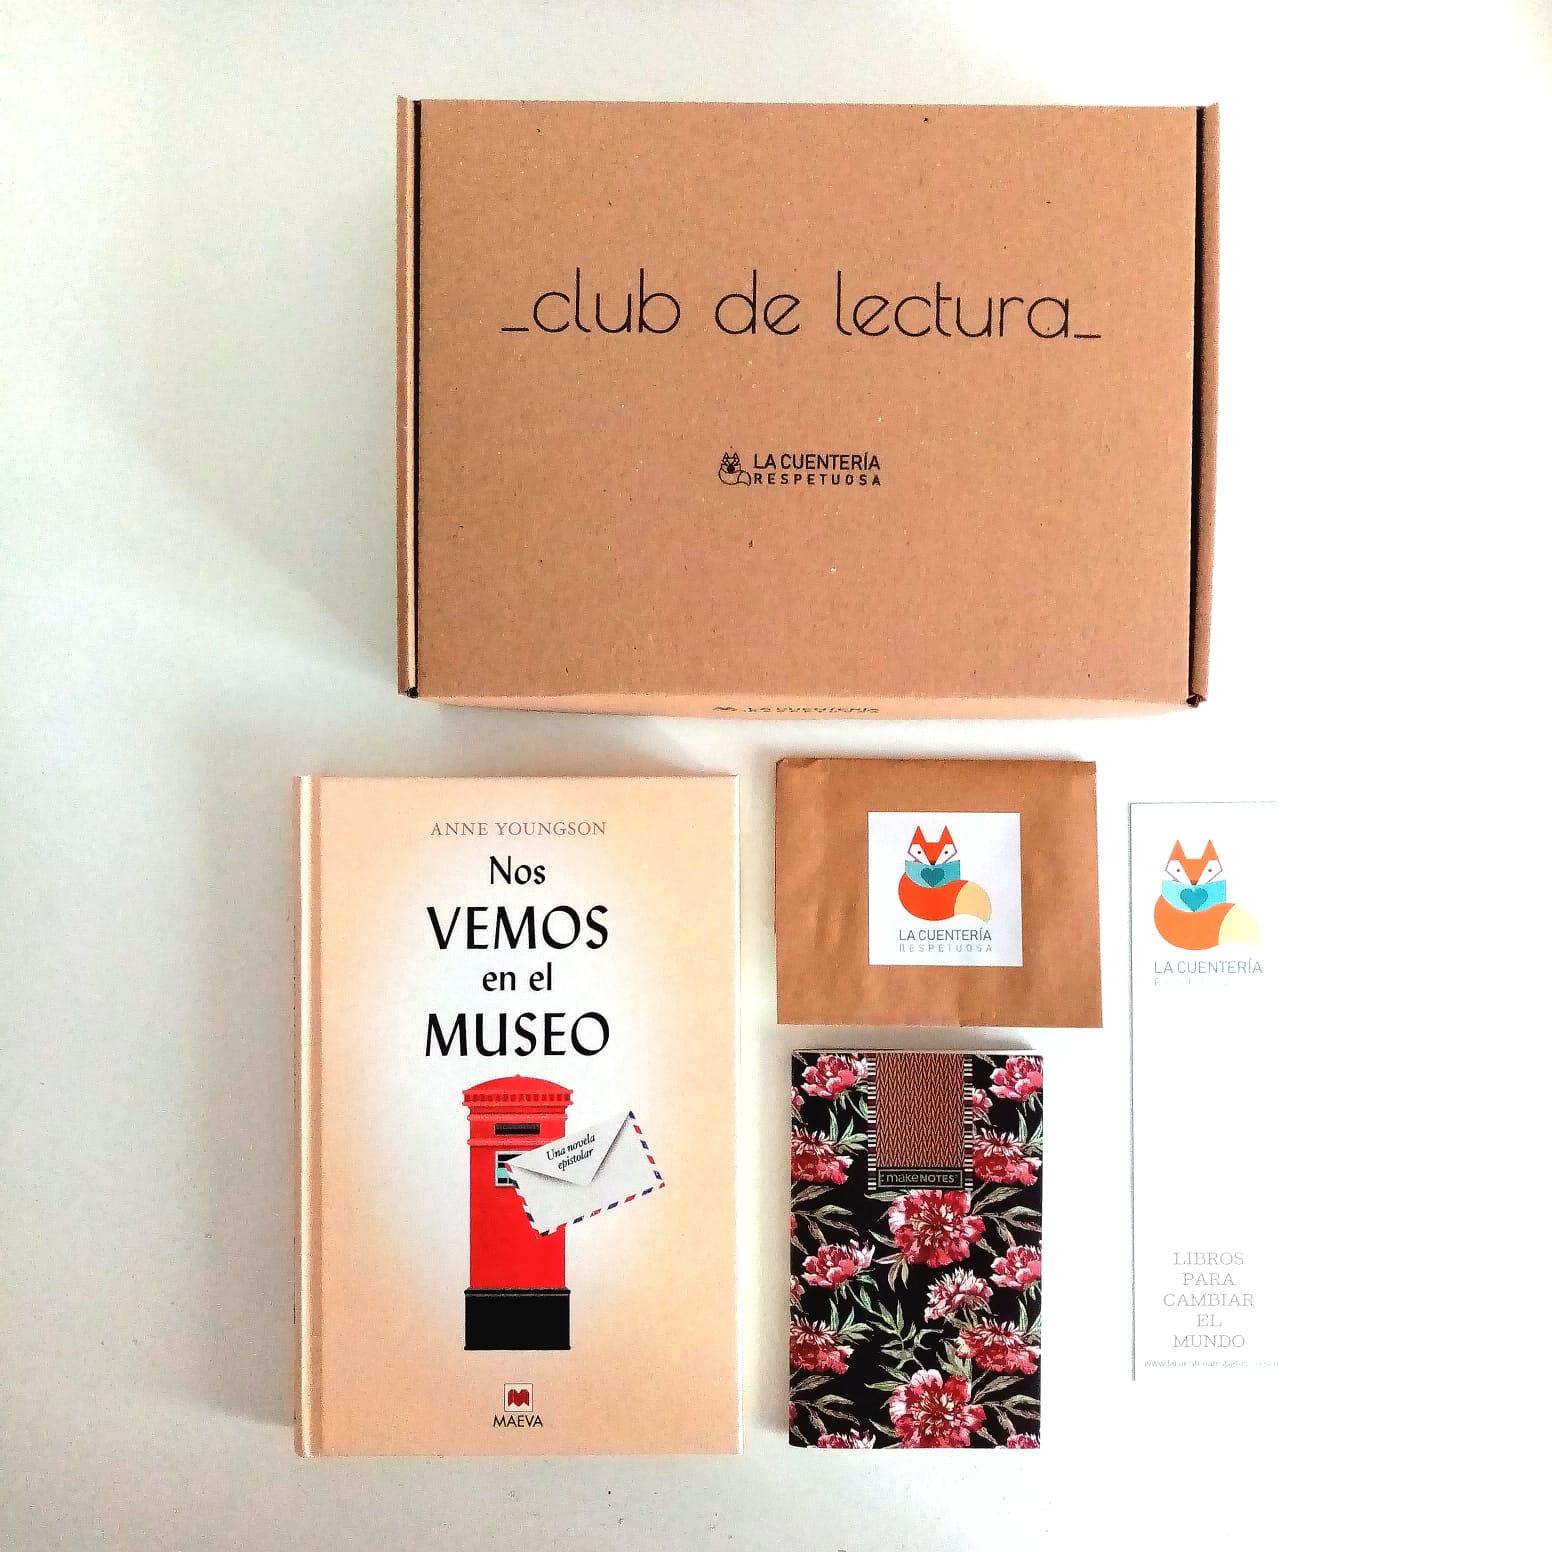 cesta club de lectura